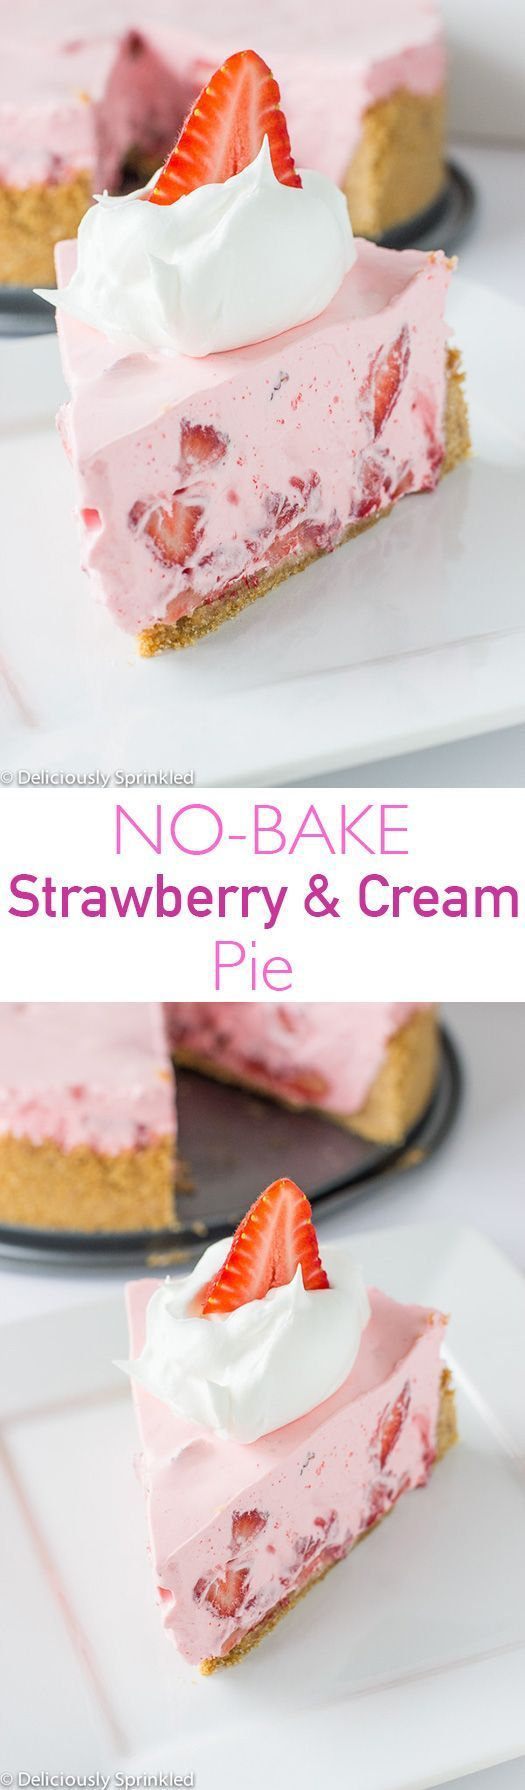 No-Bake Strawberry & Cream Pie Recipe plus 24 more of the most pinned no-bake dessert recipes